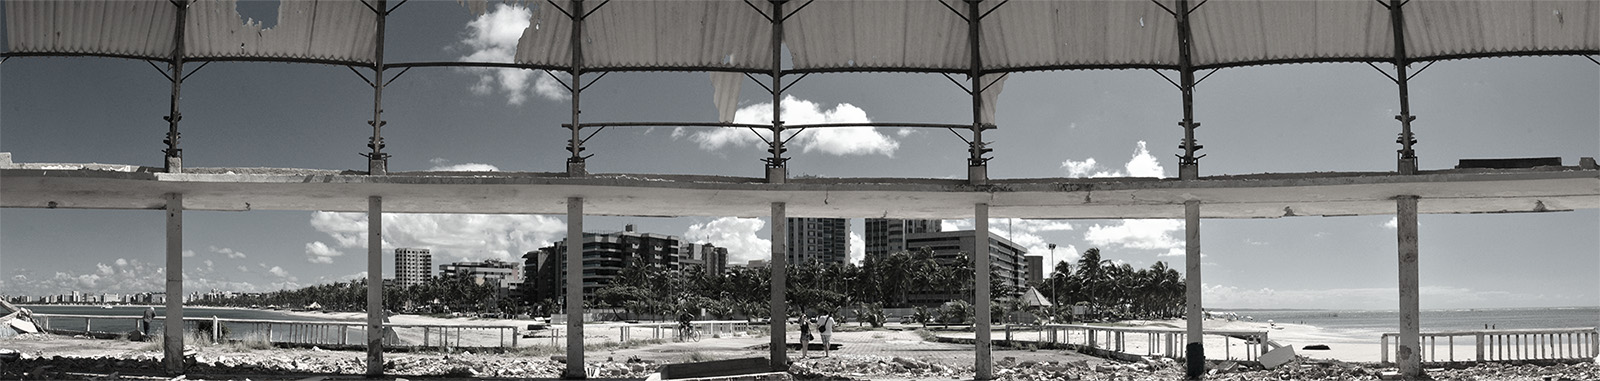 Untitled_Panorama1 menor copy PB.jpg